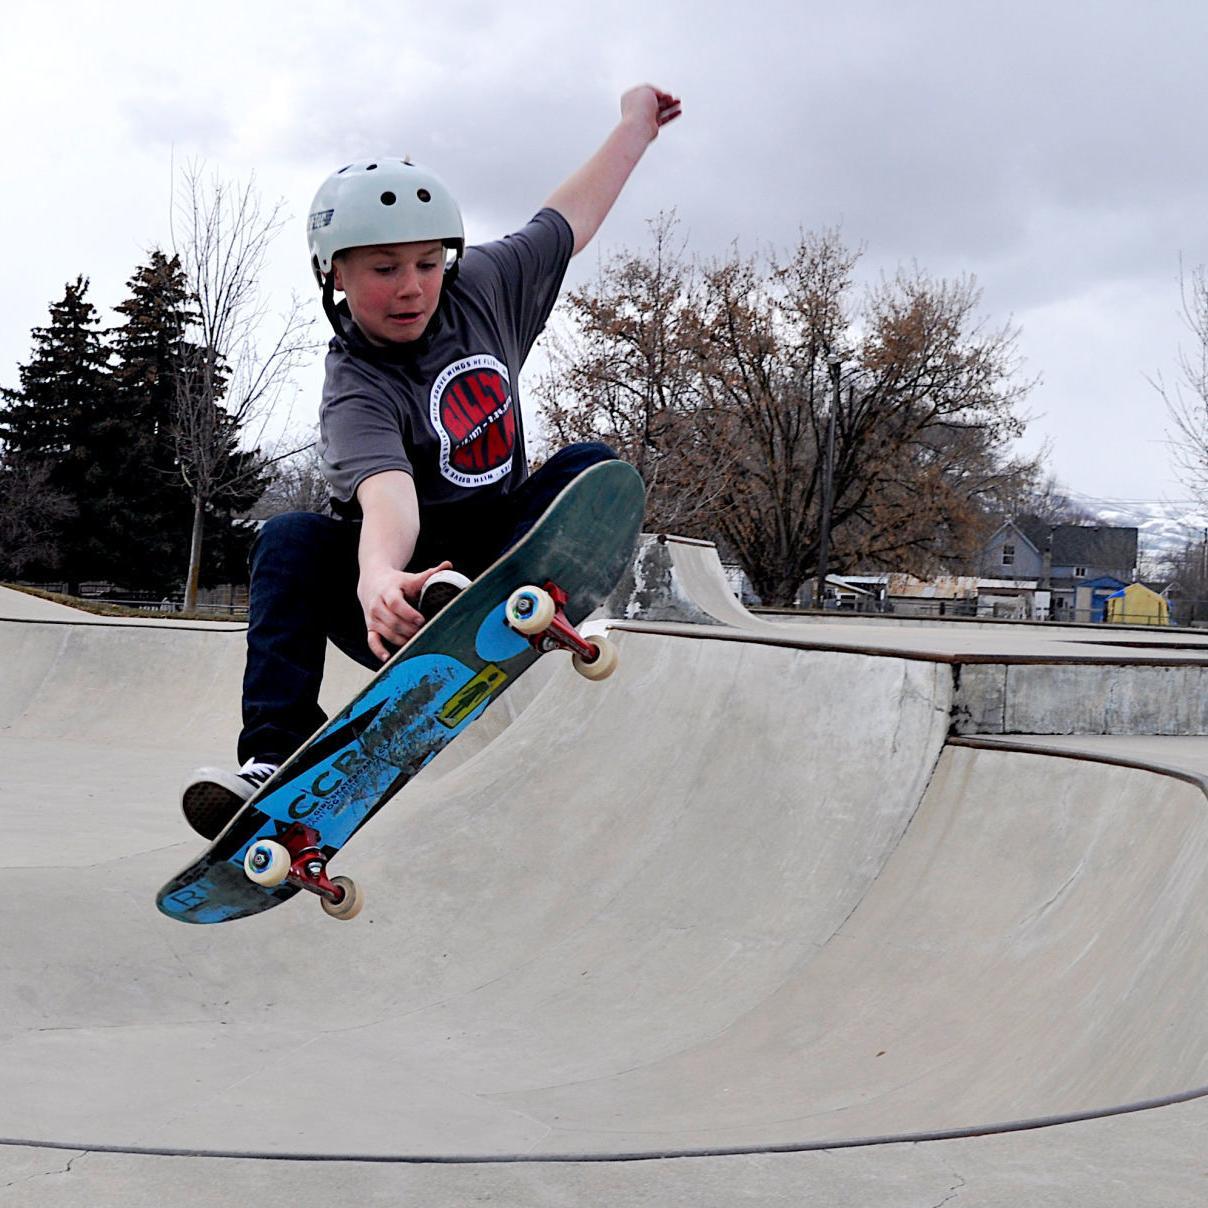 Memorial sesh: Community celebrates life of local skater Billy Ryan